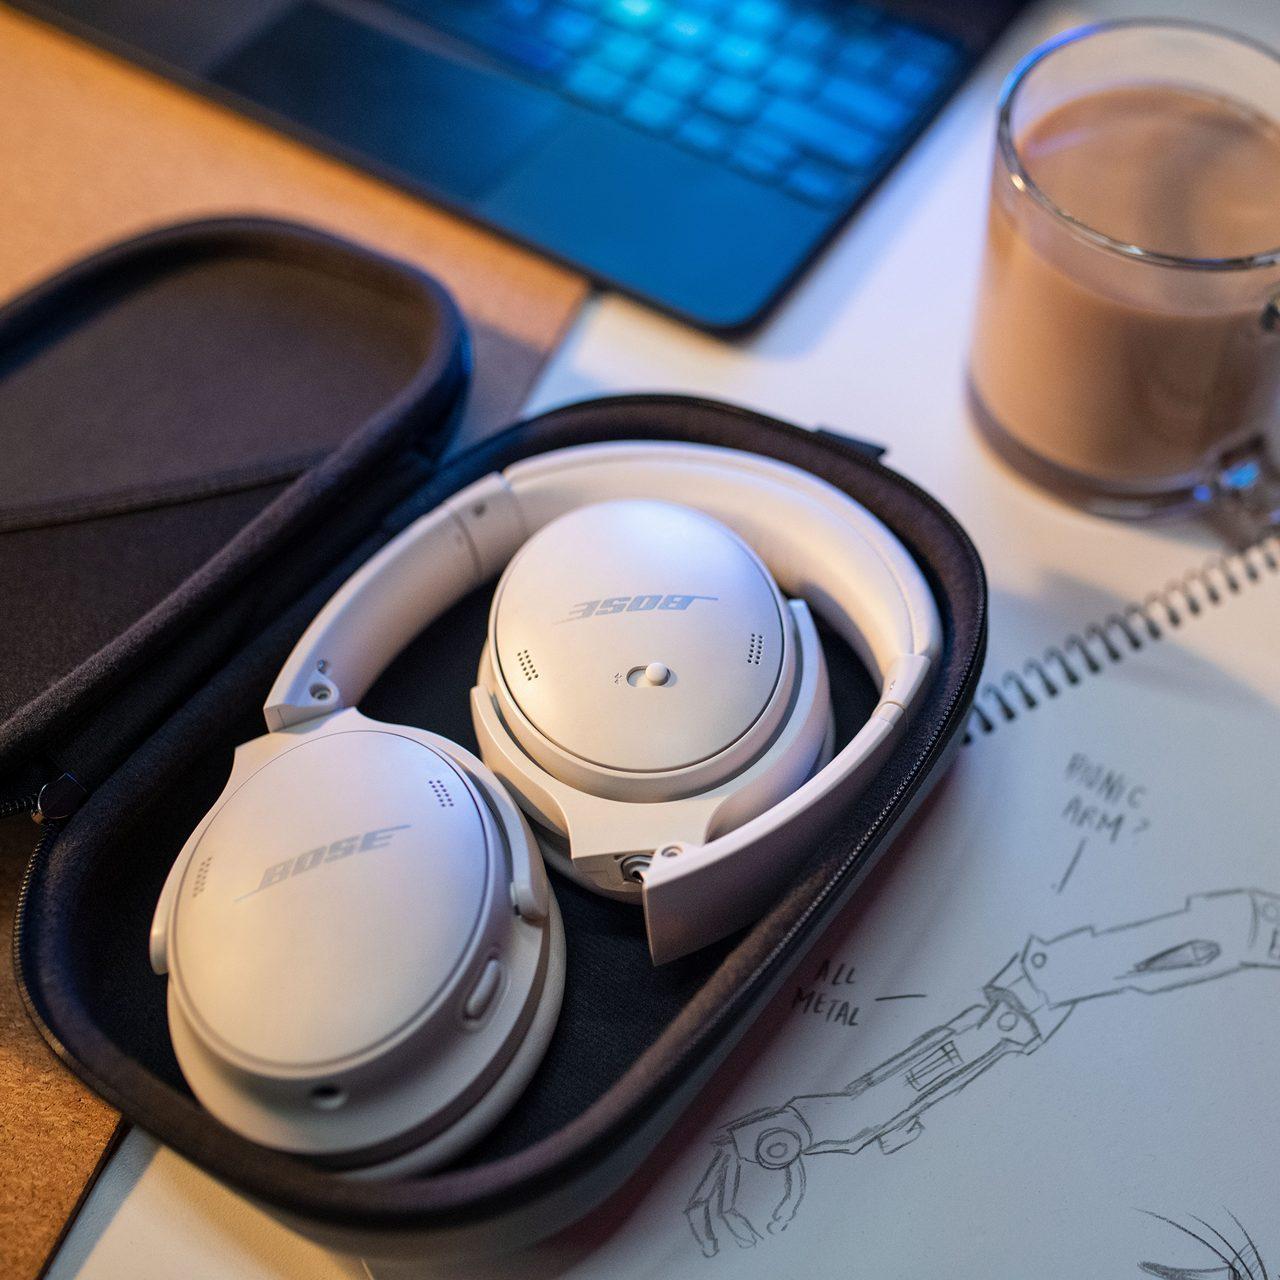 Bose's QuietComfort 45 headphones cancel more noise and last longer